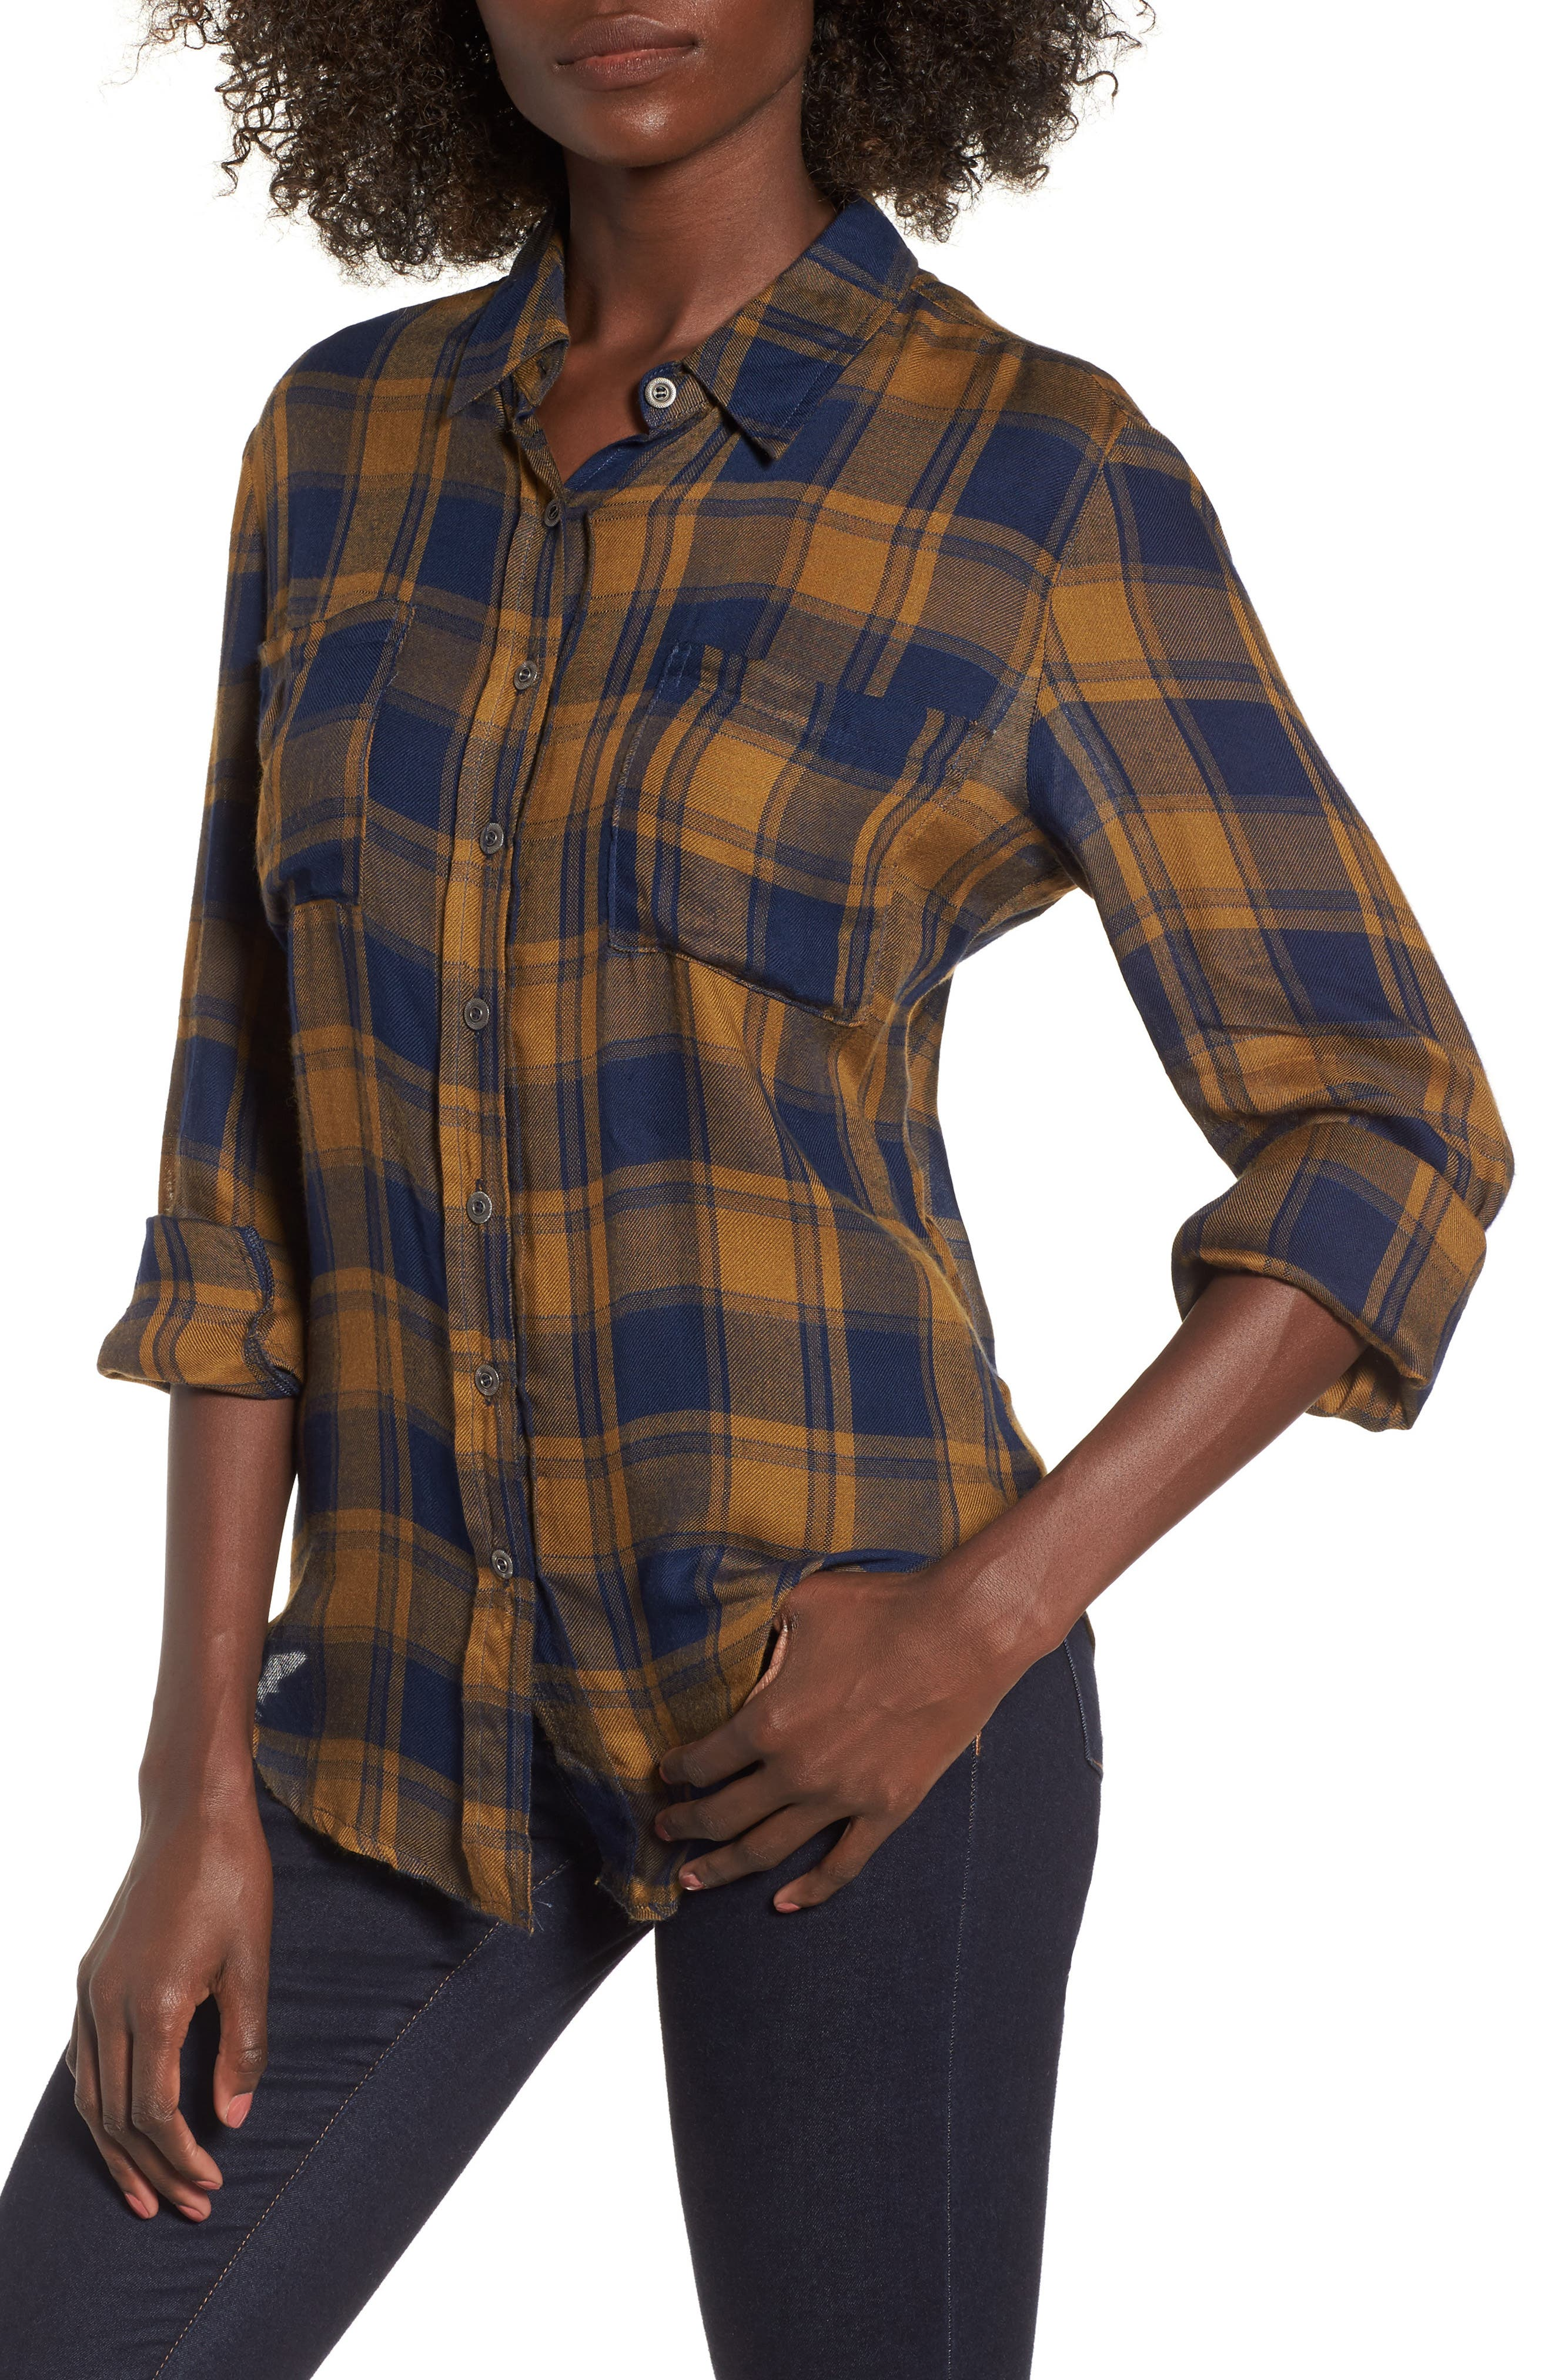 Lira Clothing Anarchy Plaid Shirt